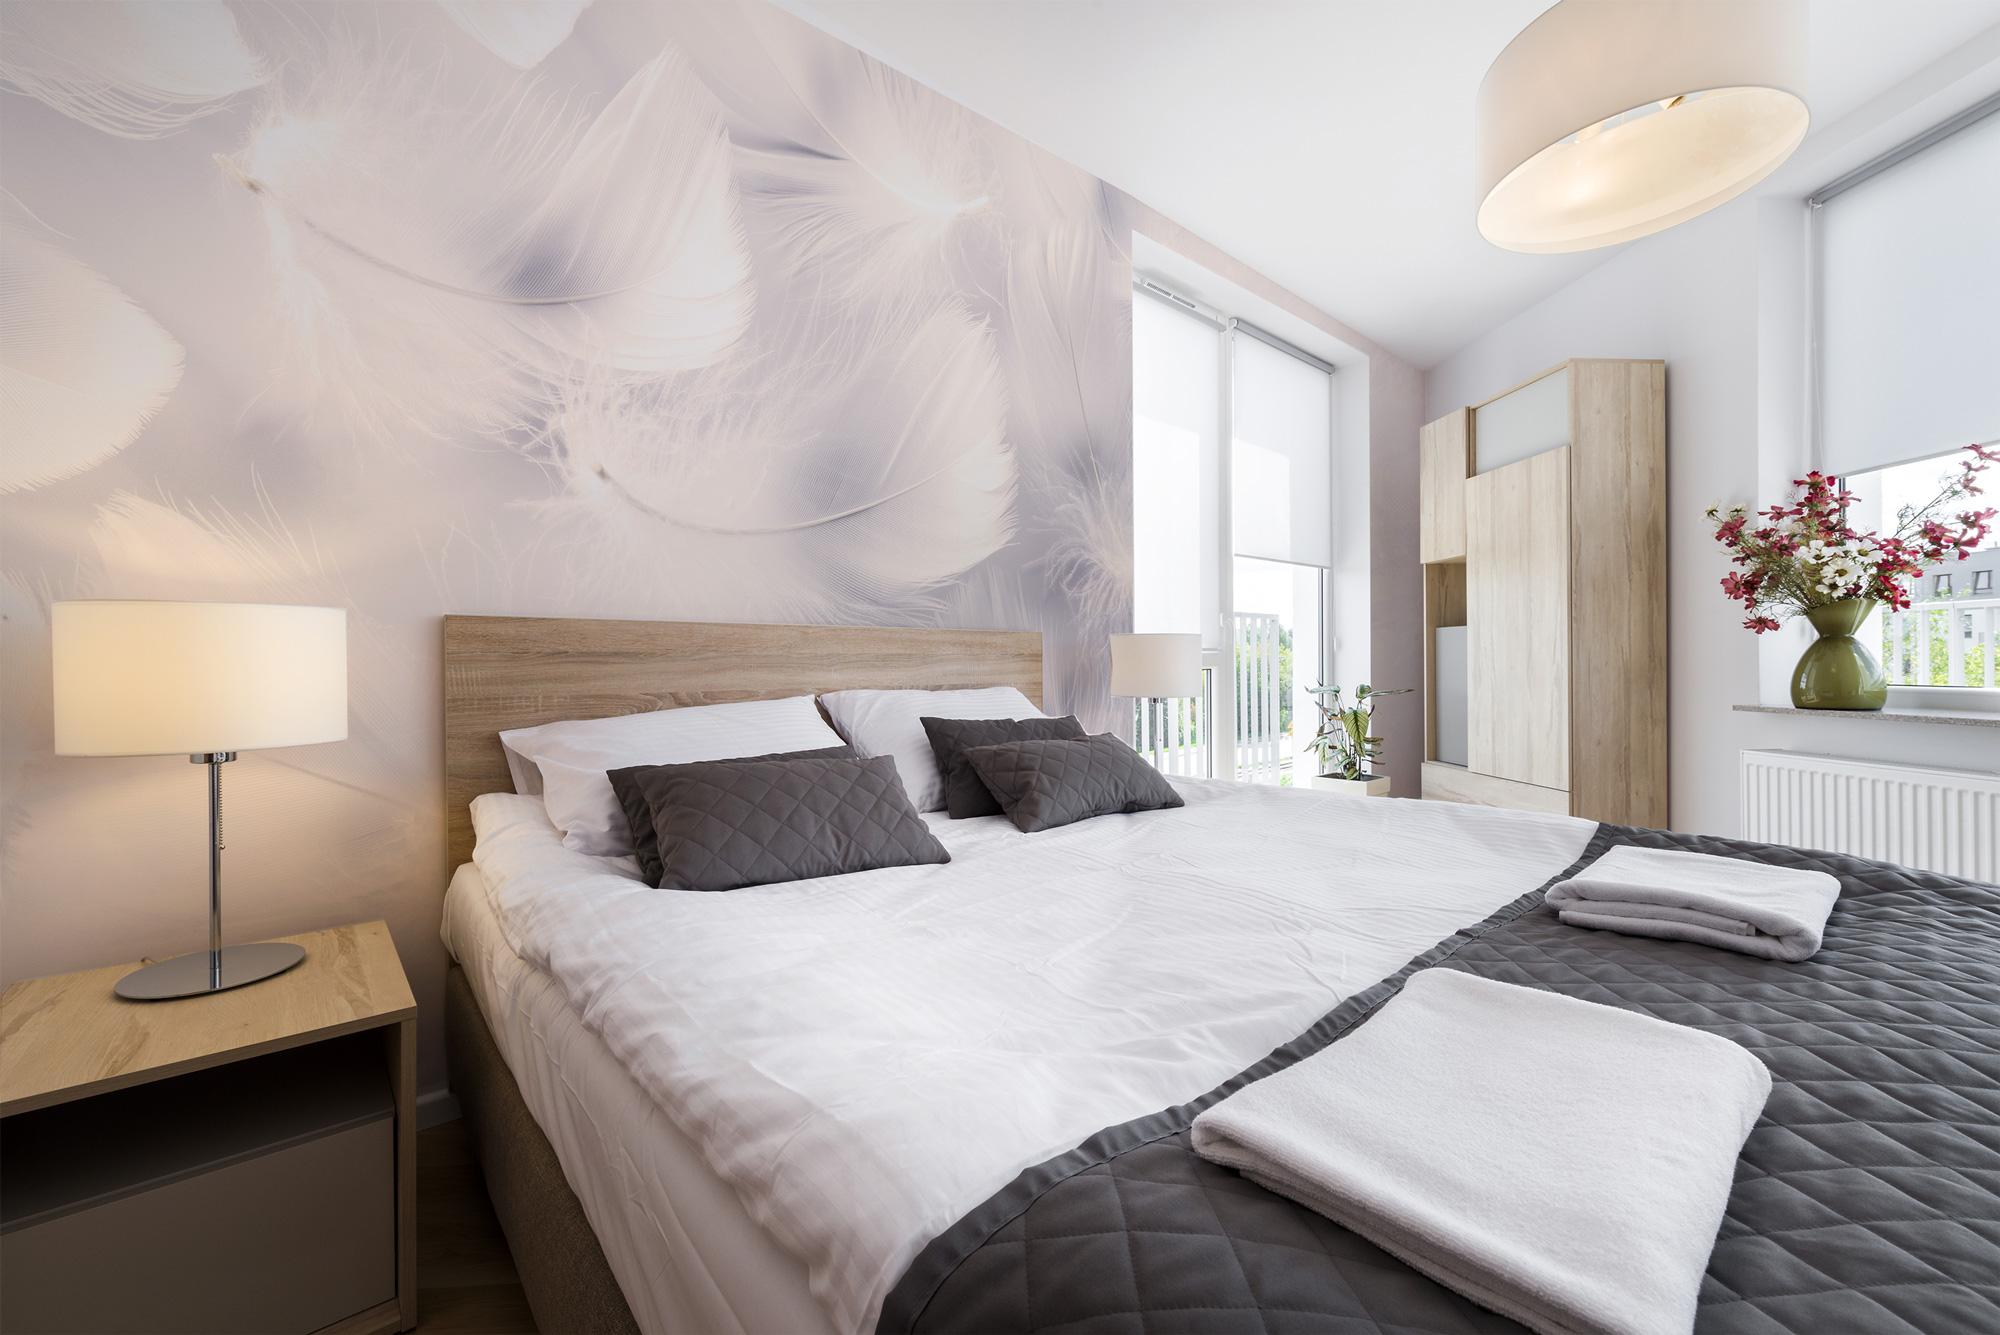 evergreen des rev tements muraux cologiques acte deco. Black Bedroom Furniture Sets. Home Design Ideas